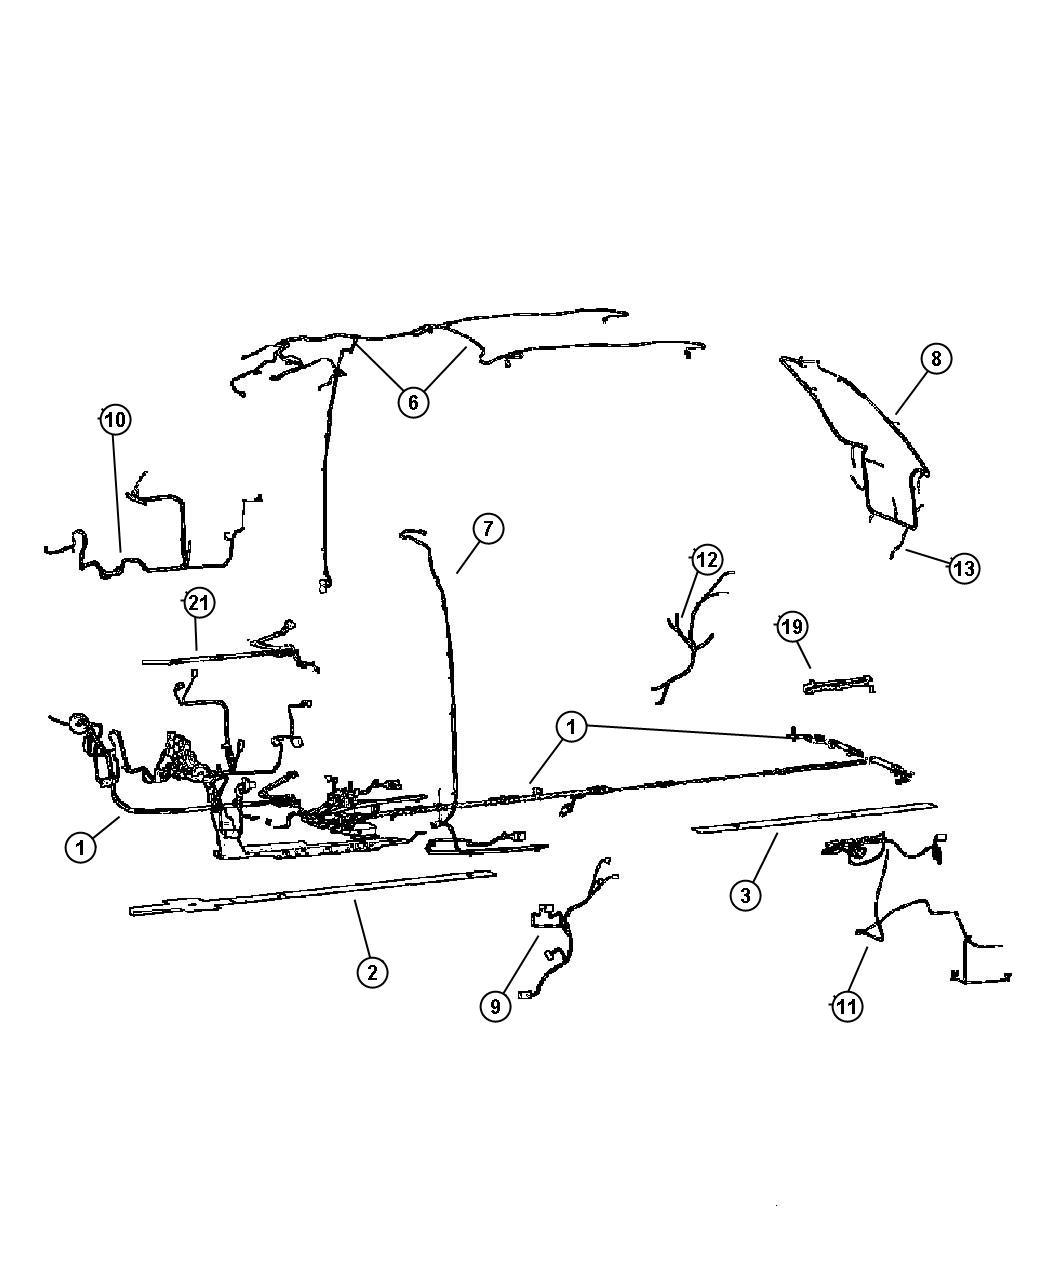 dodge ram 1500 harness  wiring  heated seat  seat wiring   cma    jpr  cma   hl trim code